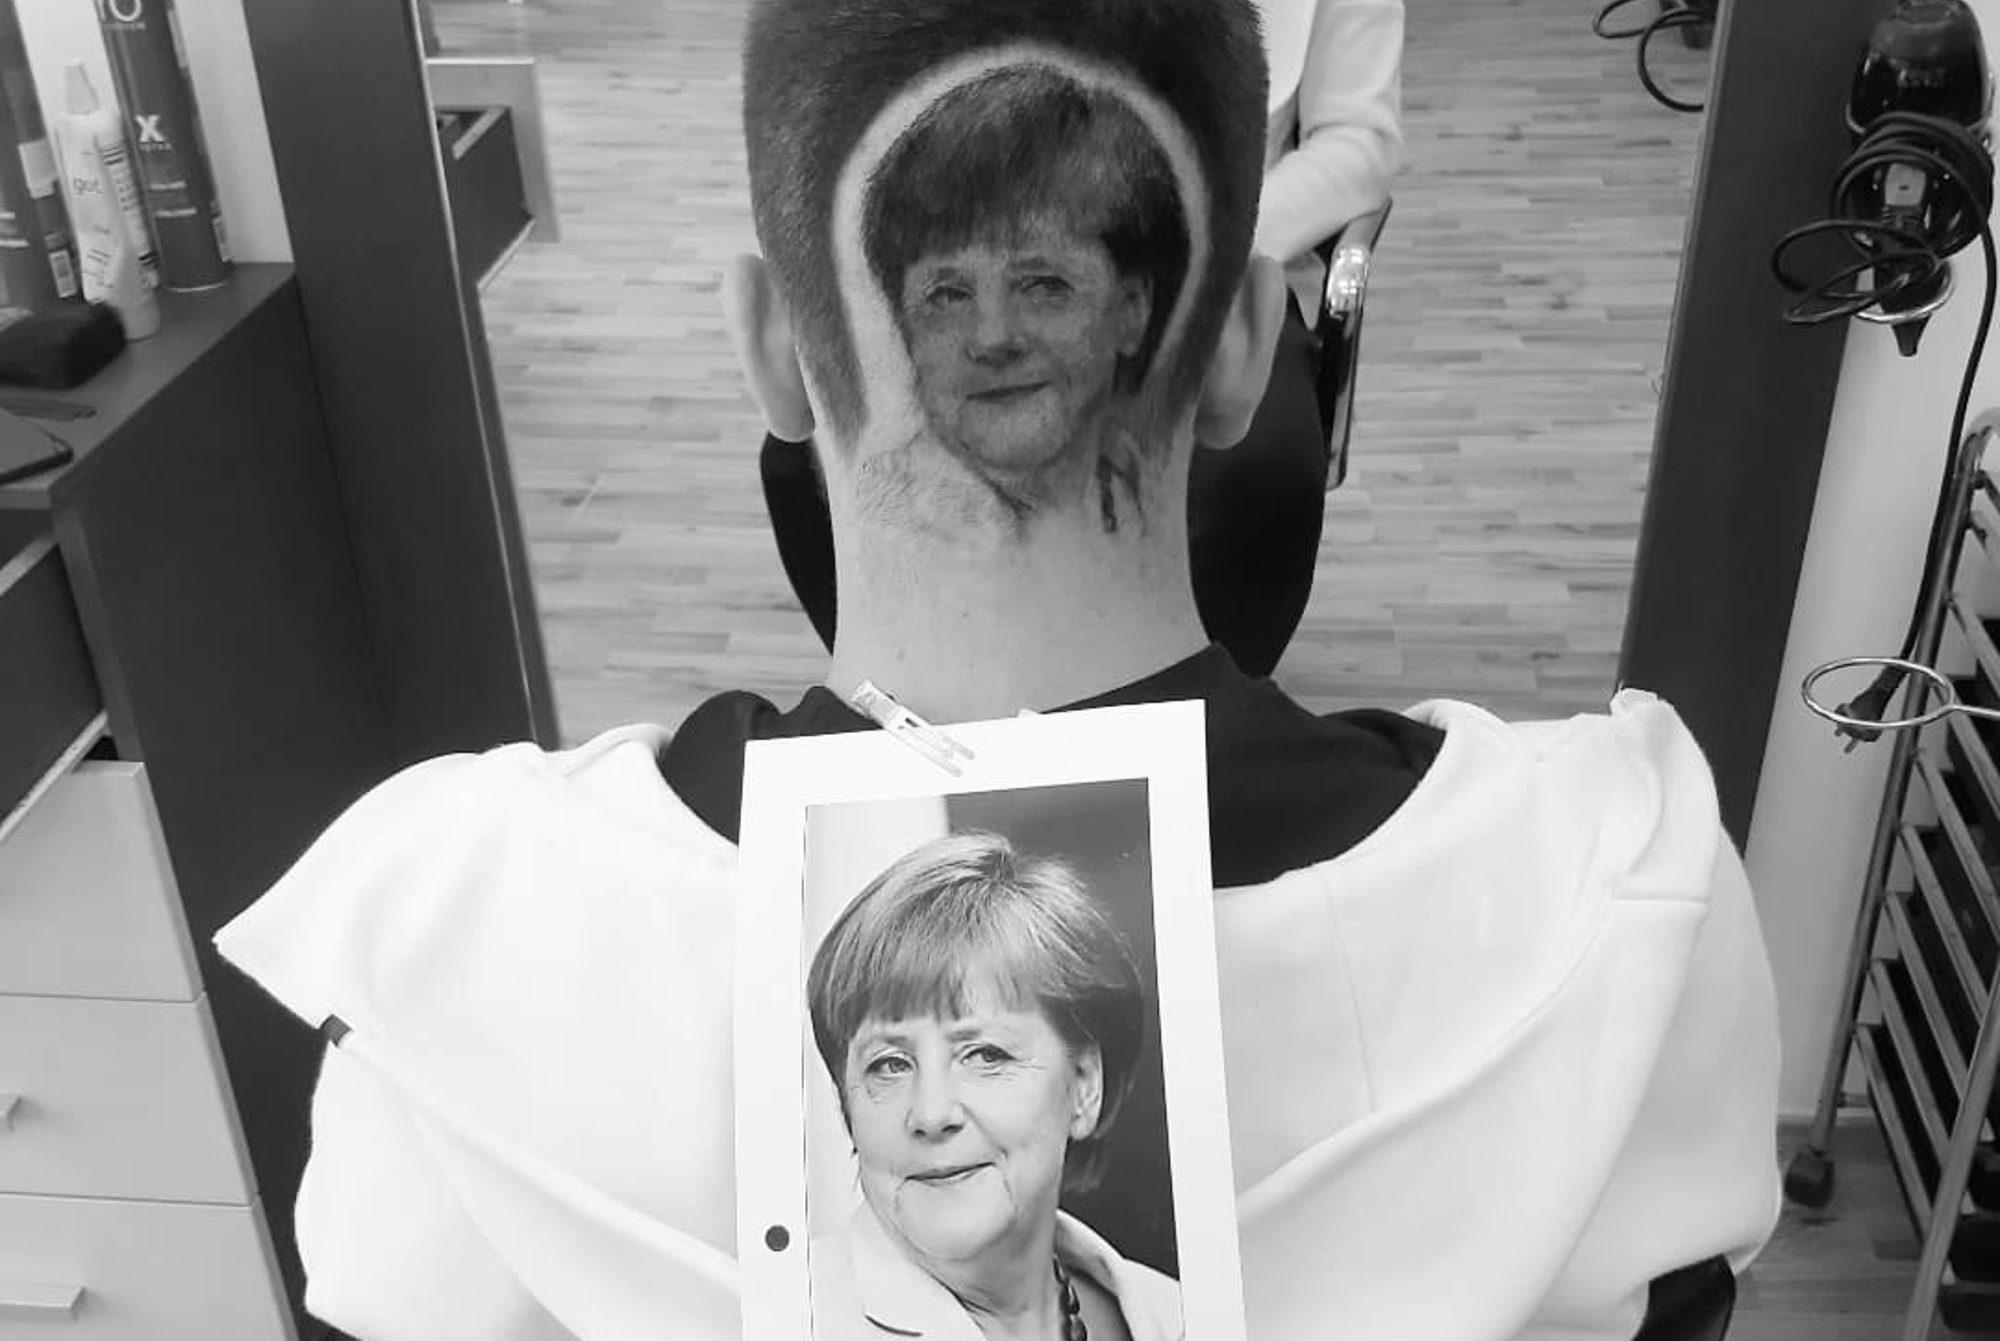 Barber Shaves Life-Like Angela Merkel Onto Clients Head